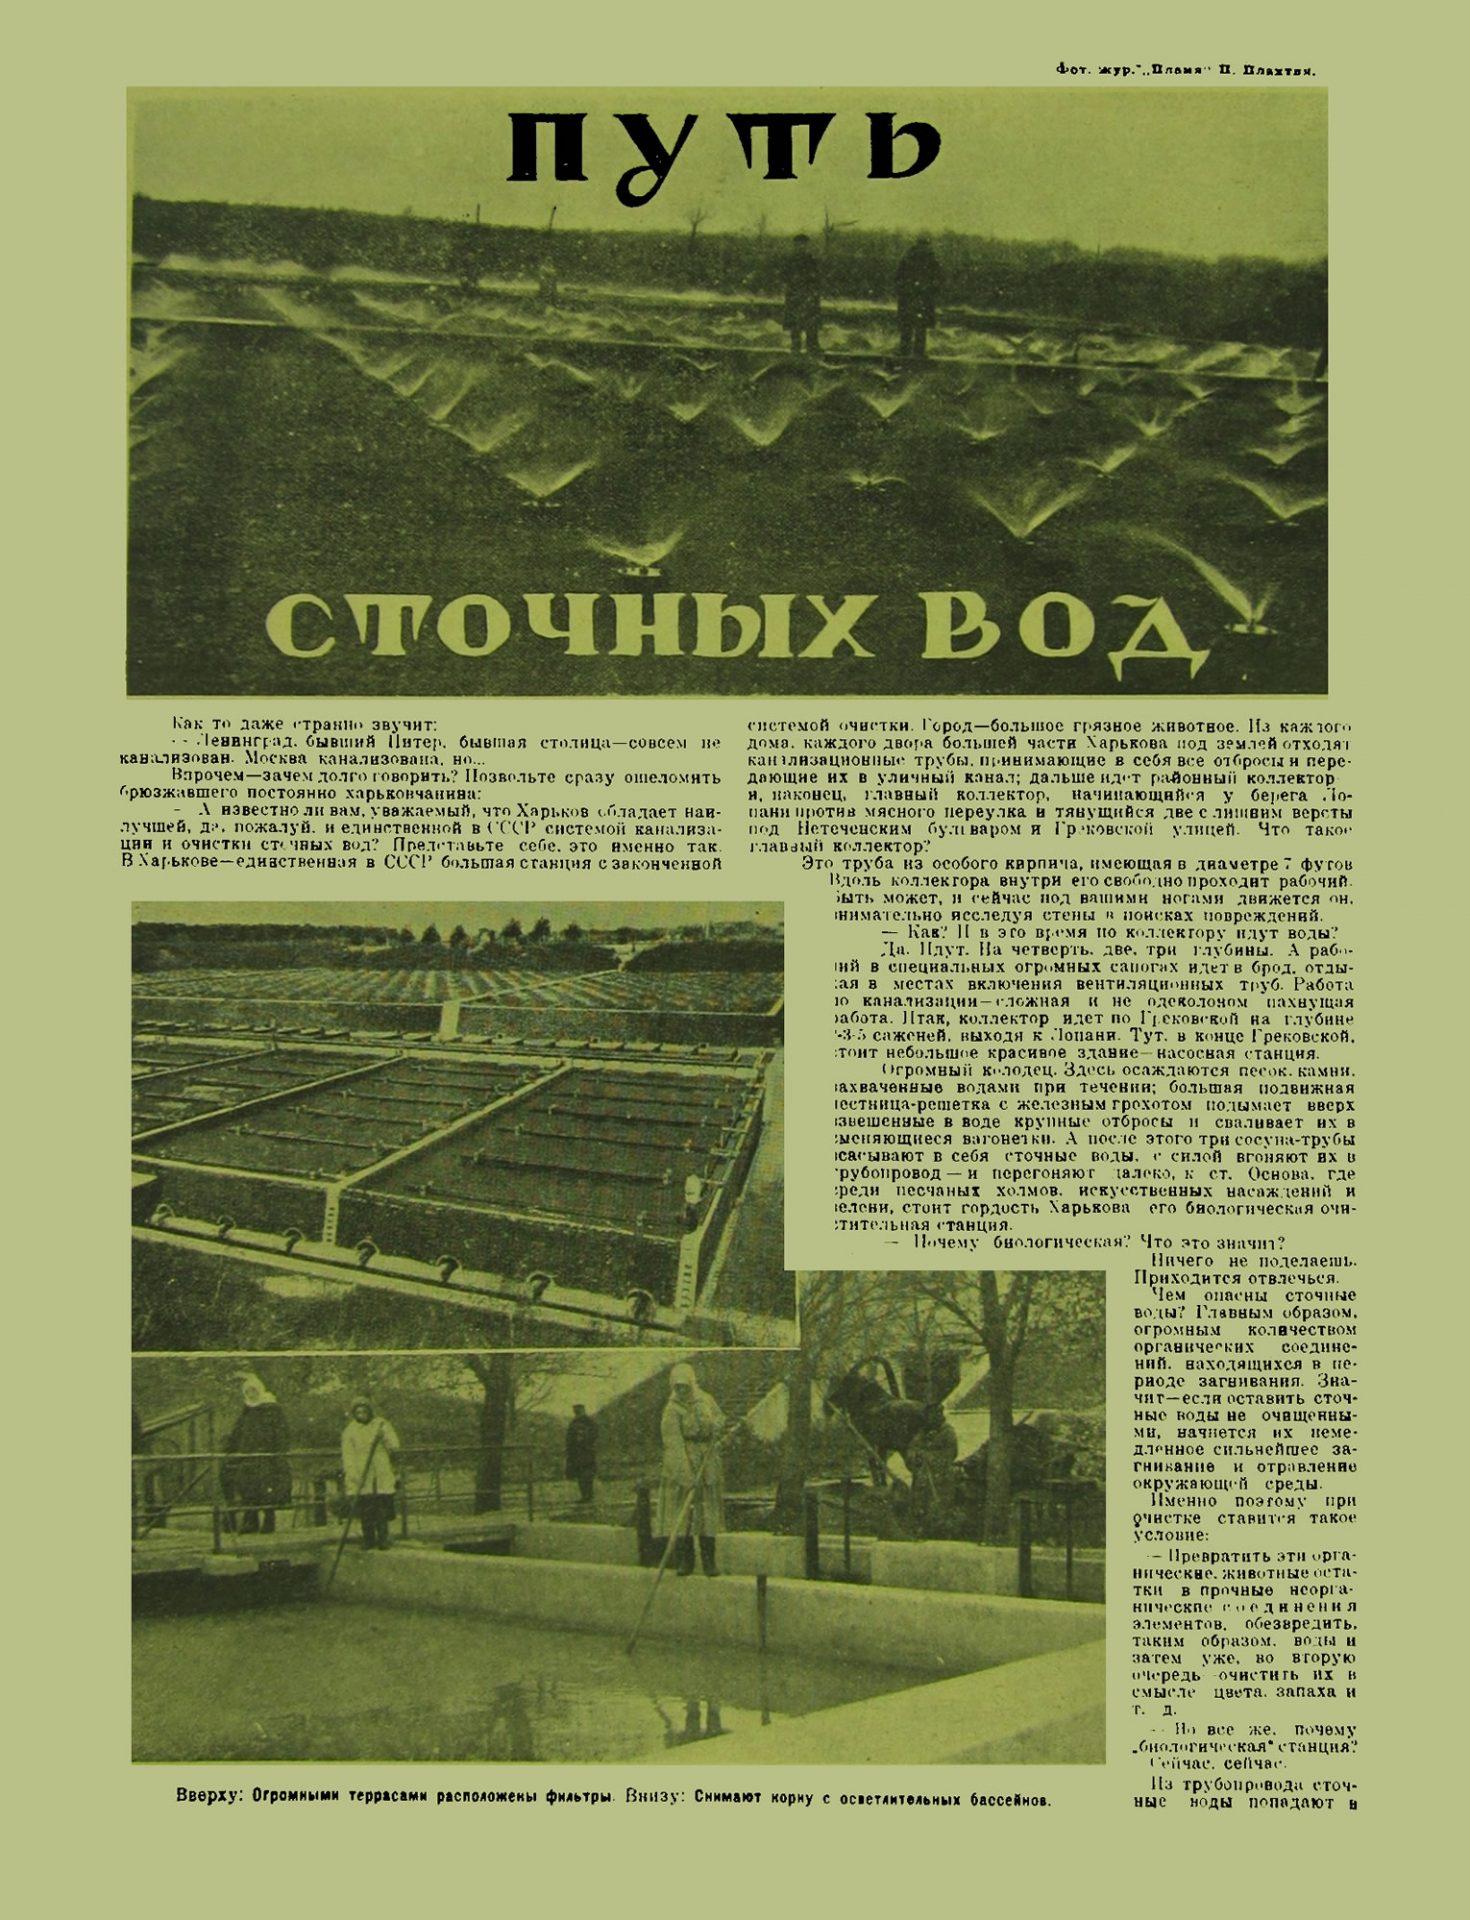 Пламя_1925_№ 22